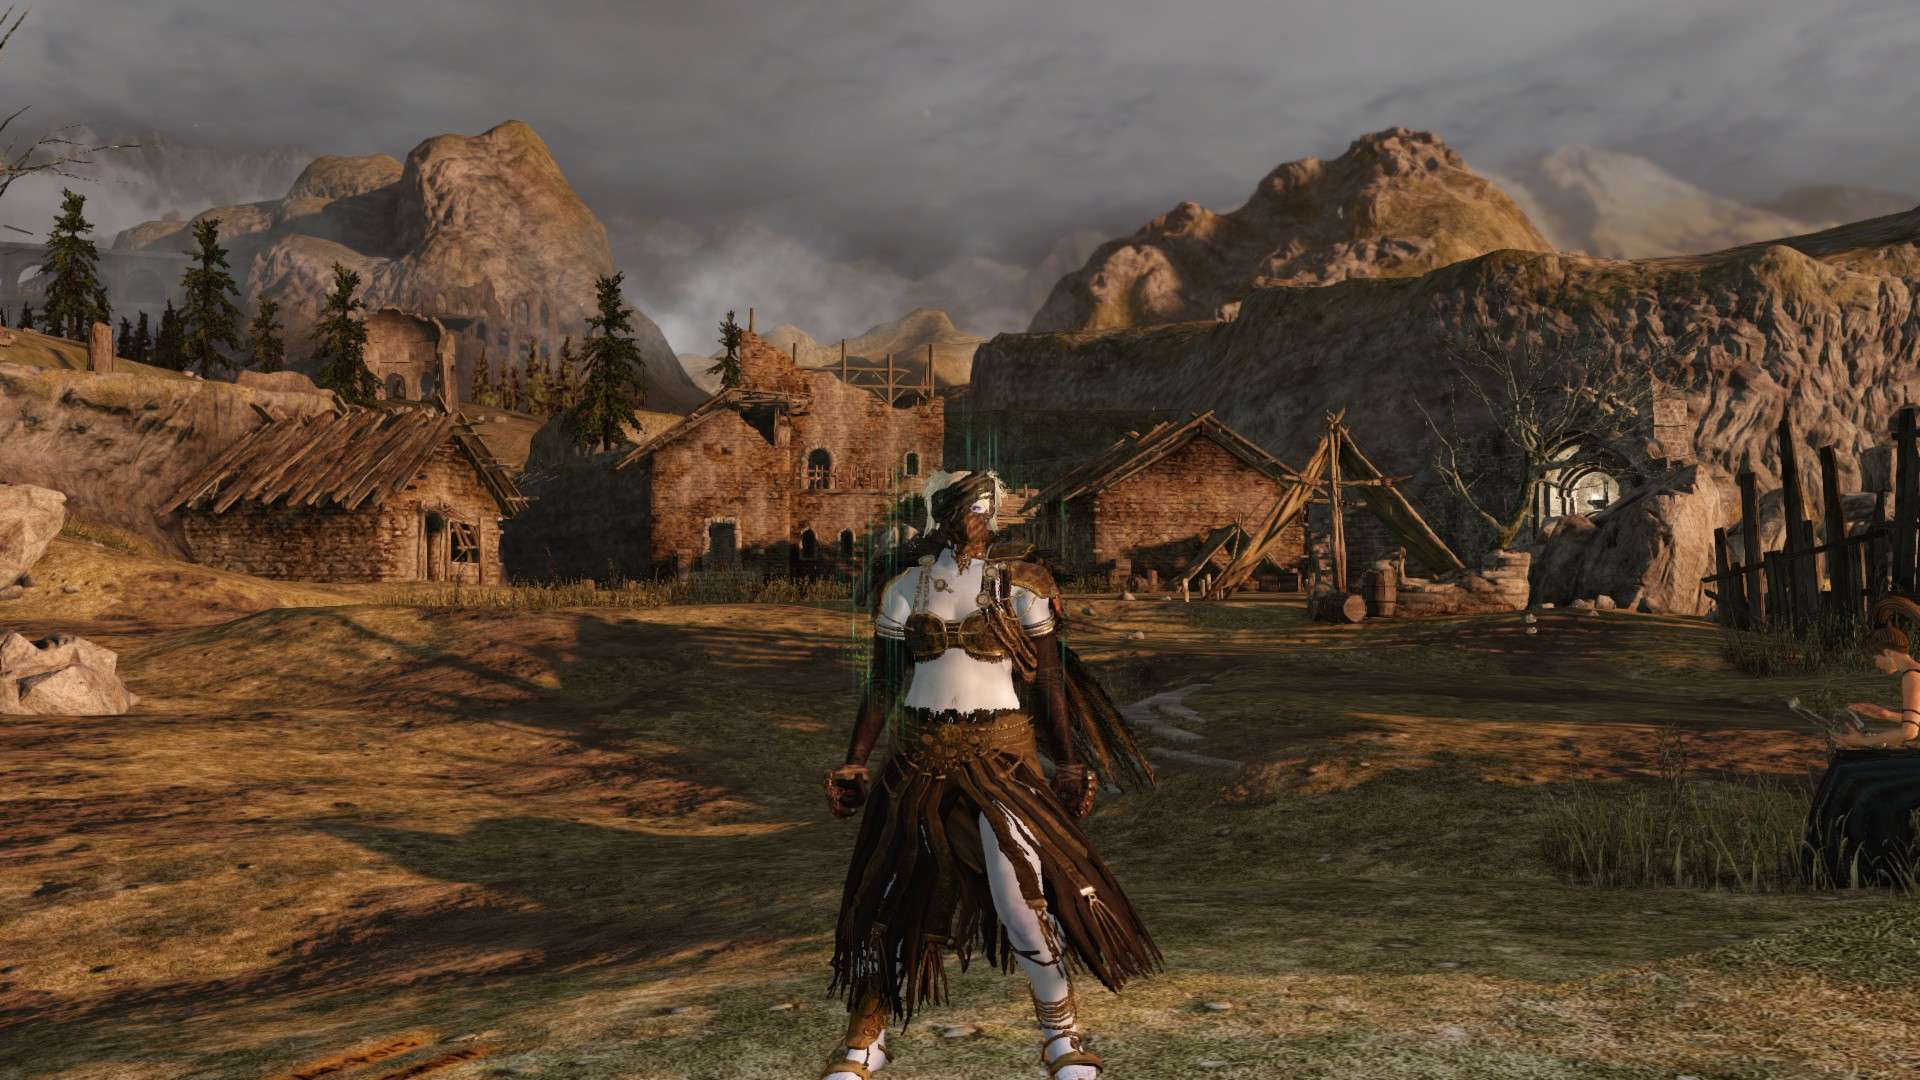 Artwork Dark Souls Ii Wallpaper: Dark Souls II Wallpapers